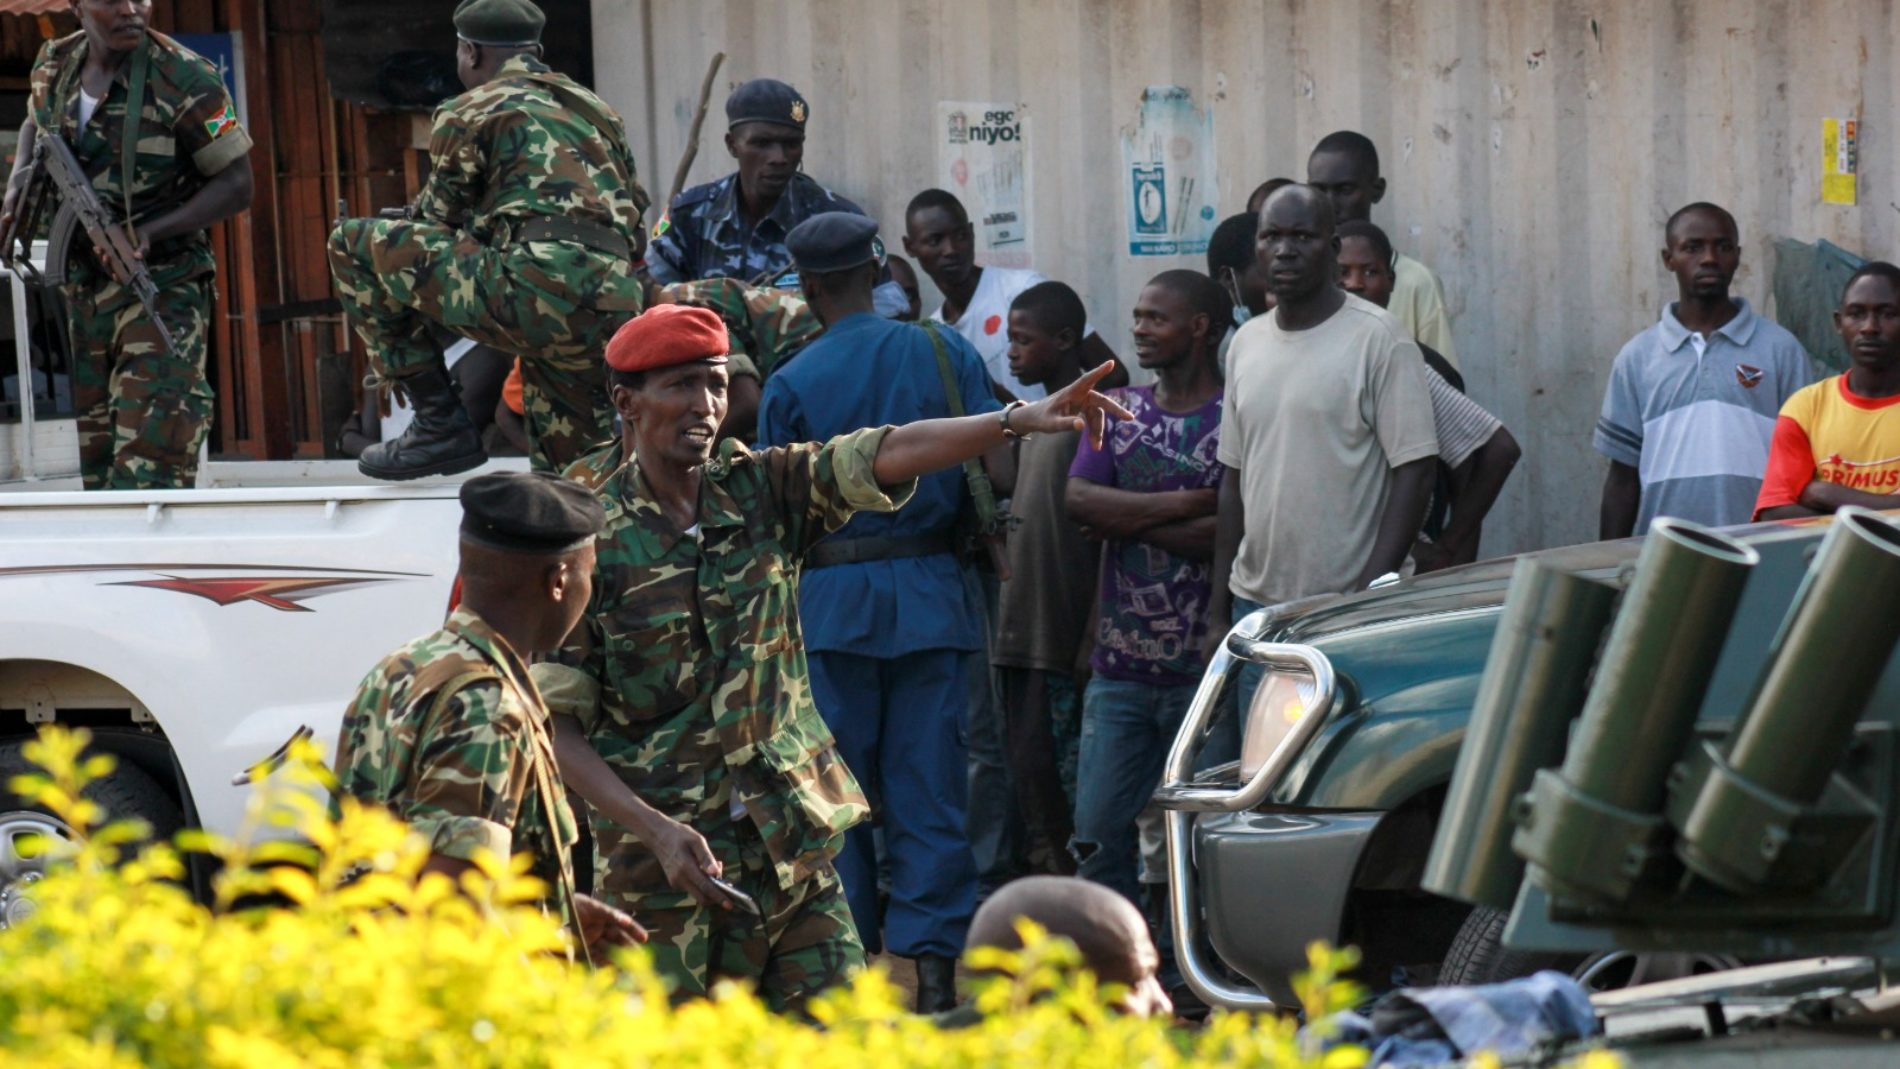 Le Général major Cyrille Ndayirukiye s'est éteint